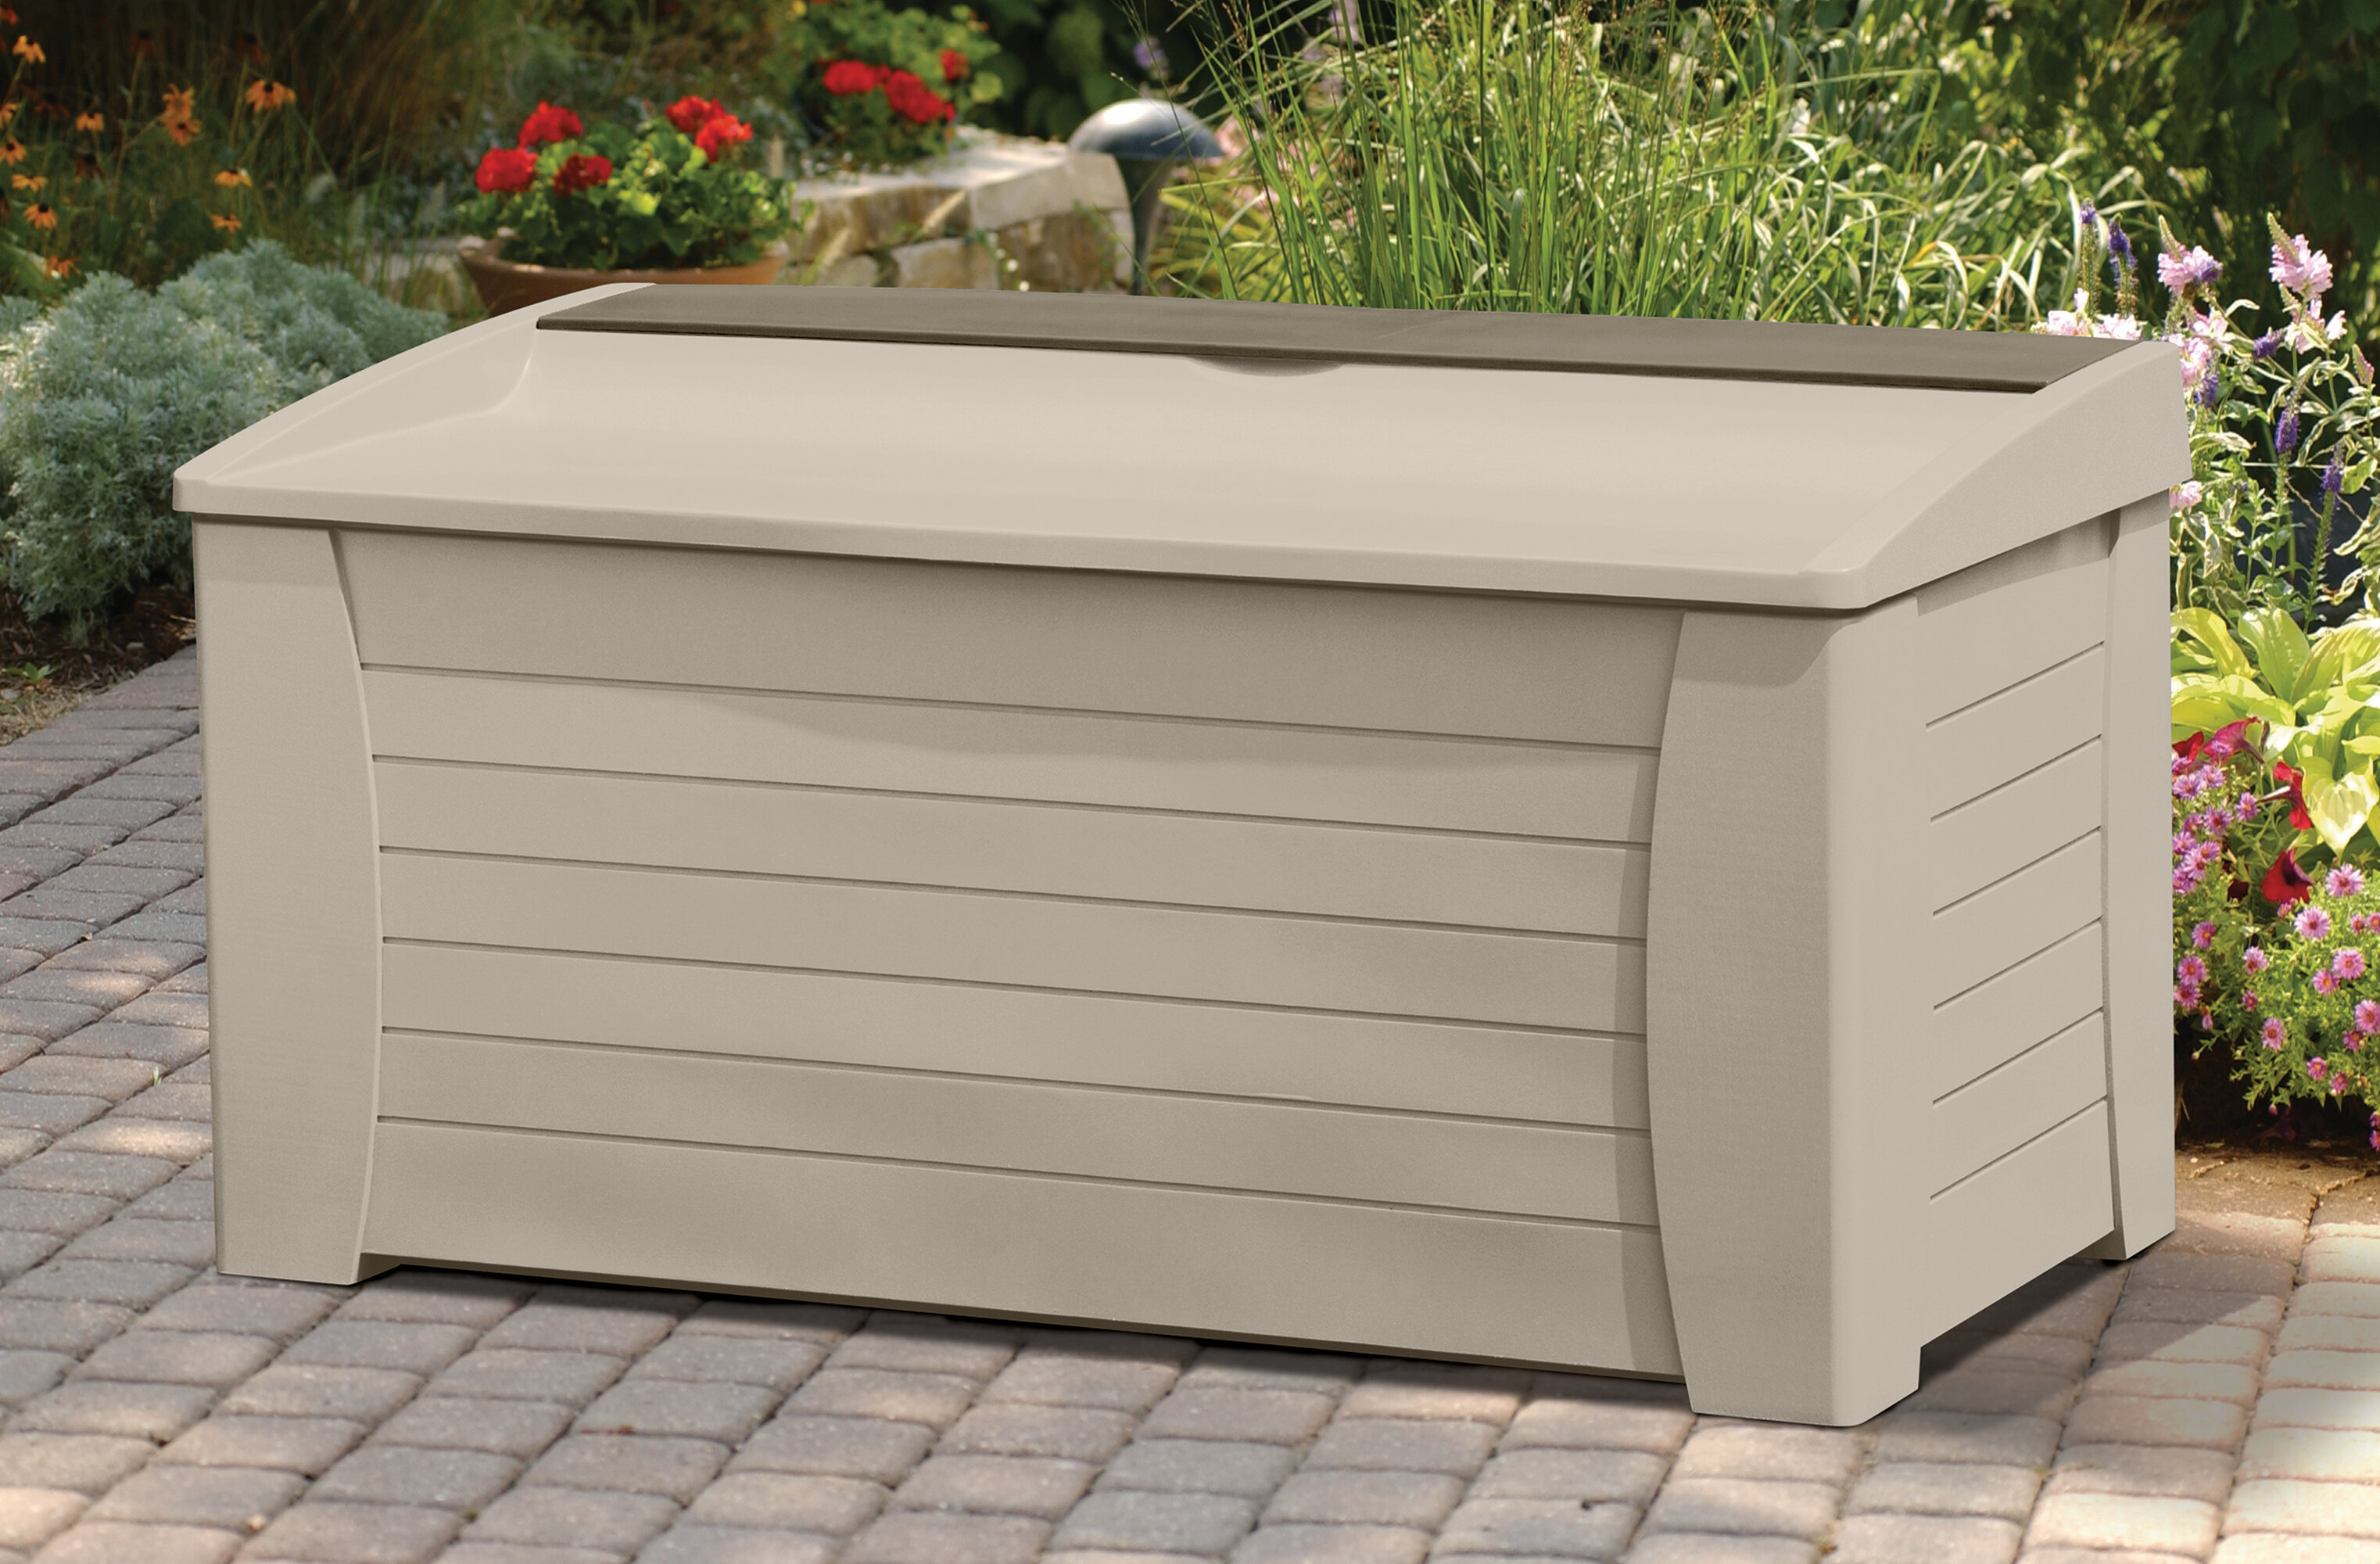 Suncast 127 Gallon Resin Deck Box & Reviews